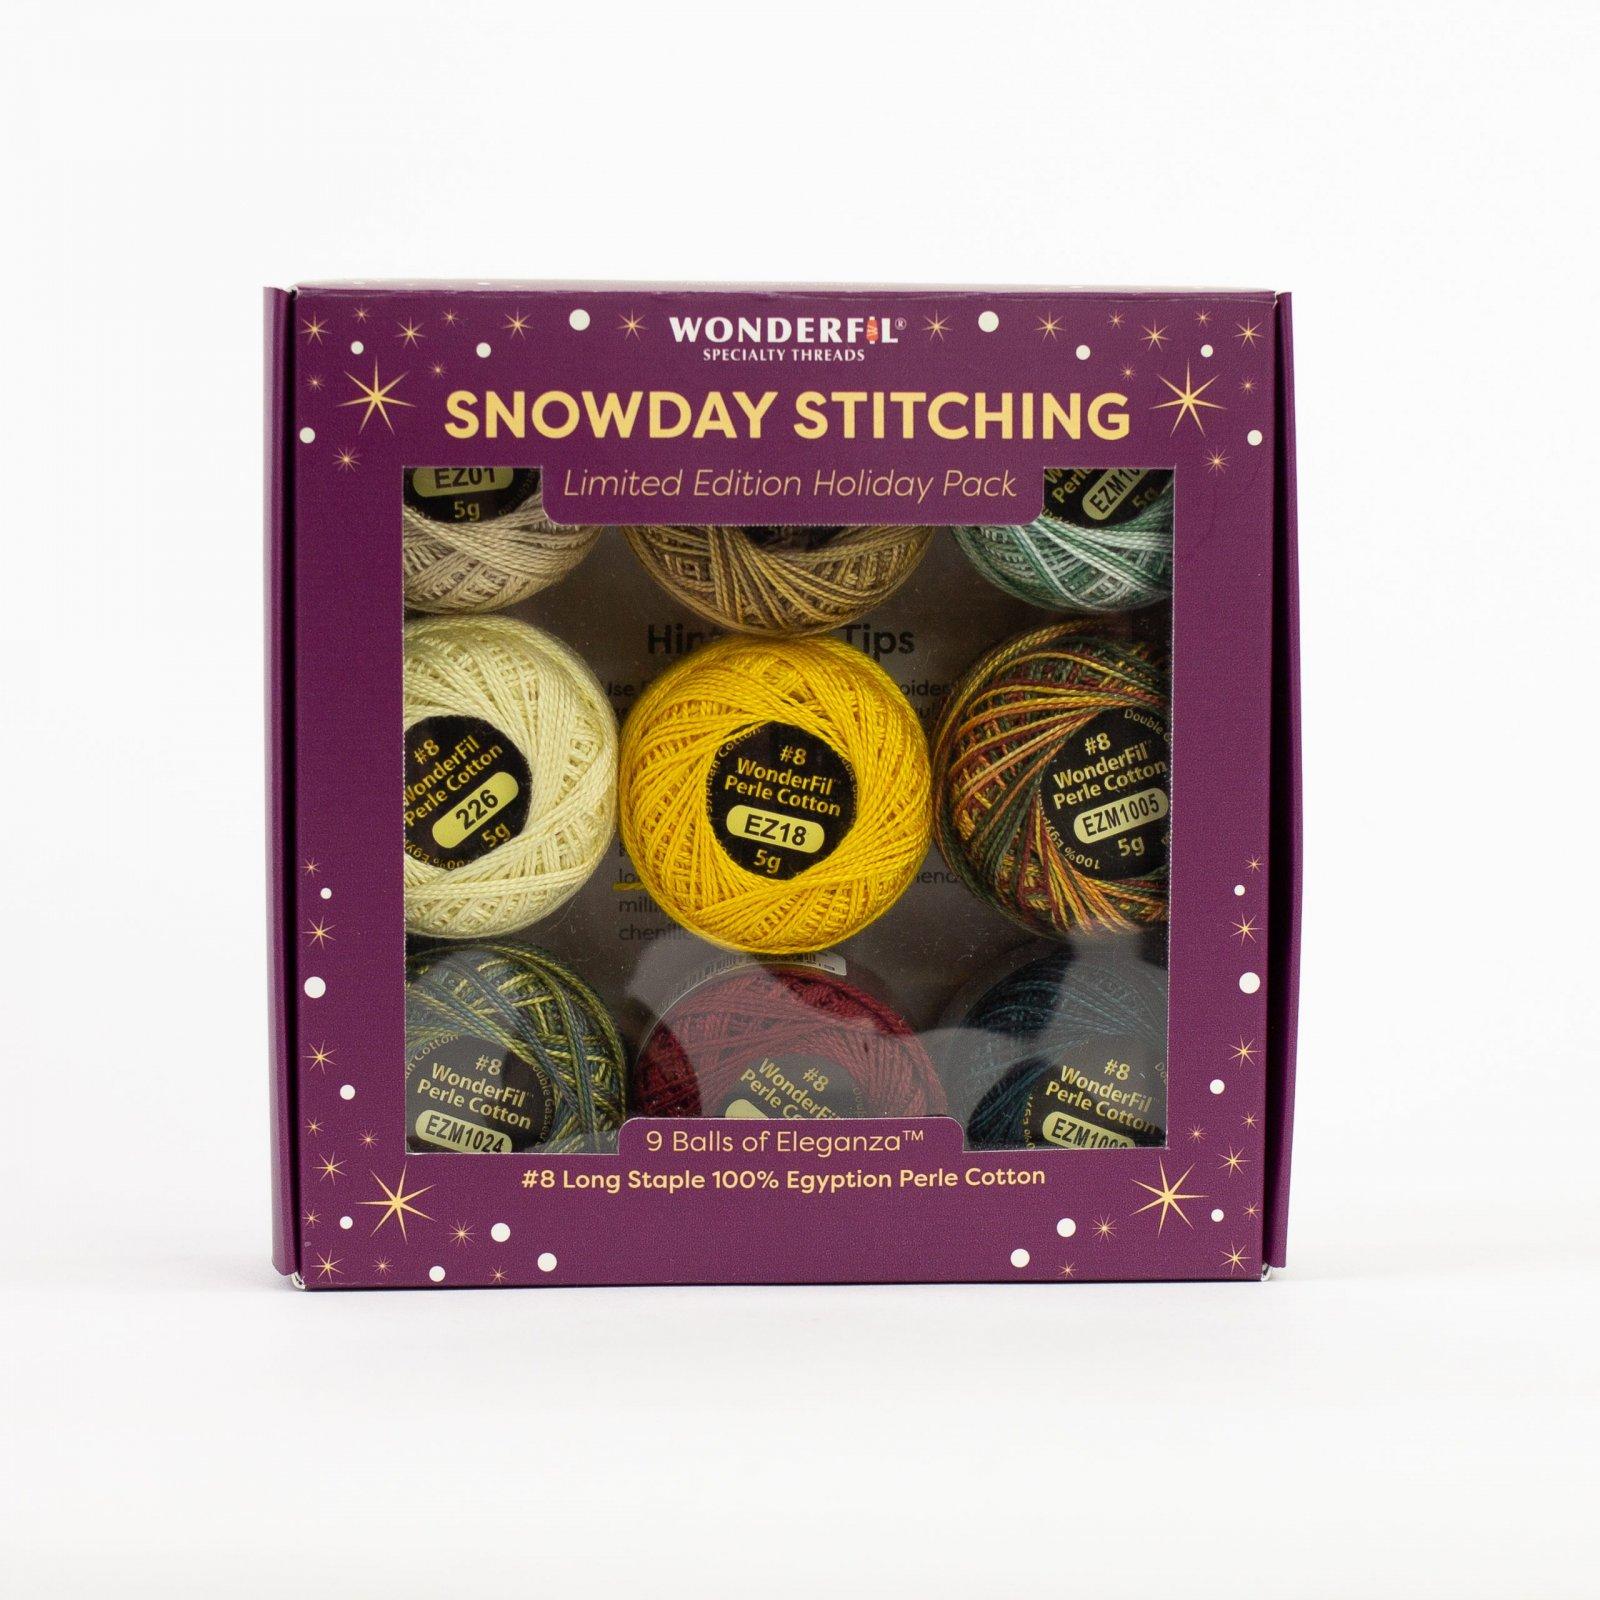 Wonderfil Snowday Stitching -- Woodland Winter/HPSS-WoodlandWinter